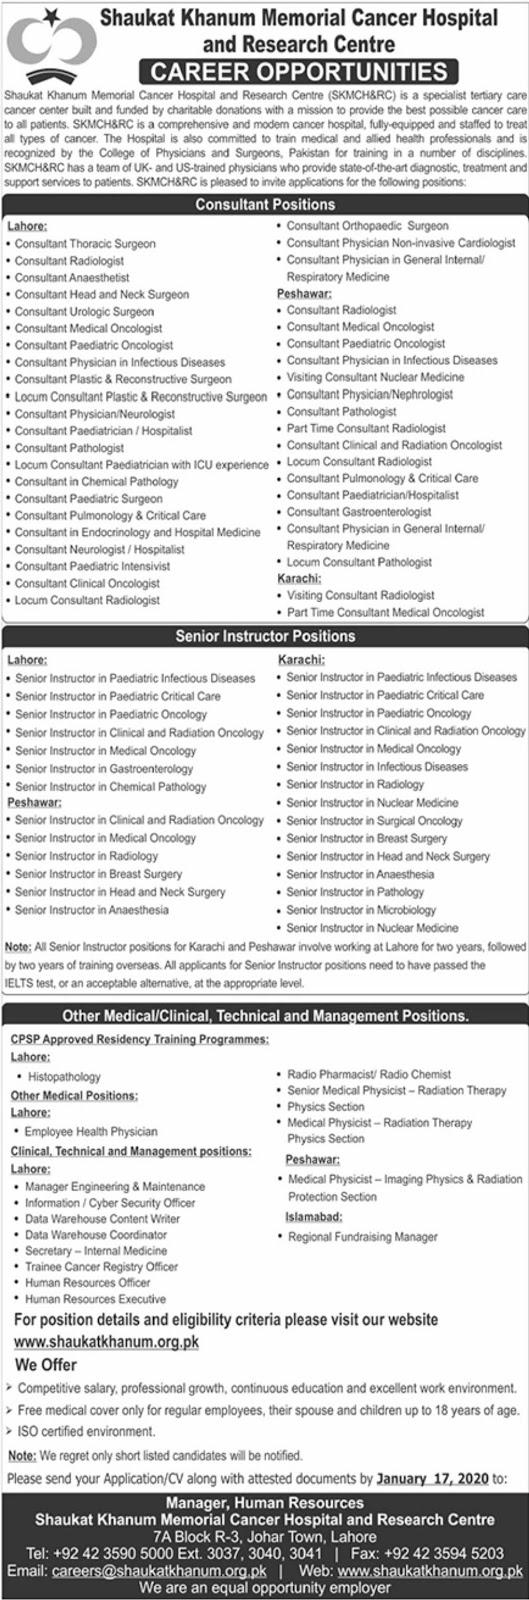 Jobs in Shaukat Khanum Memorial